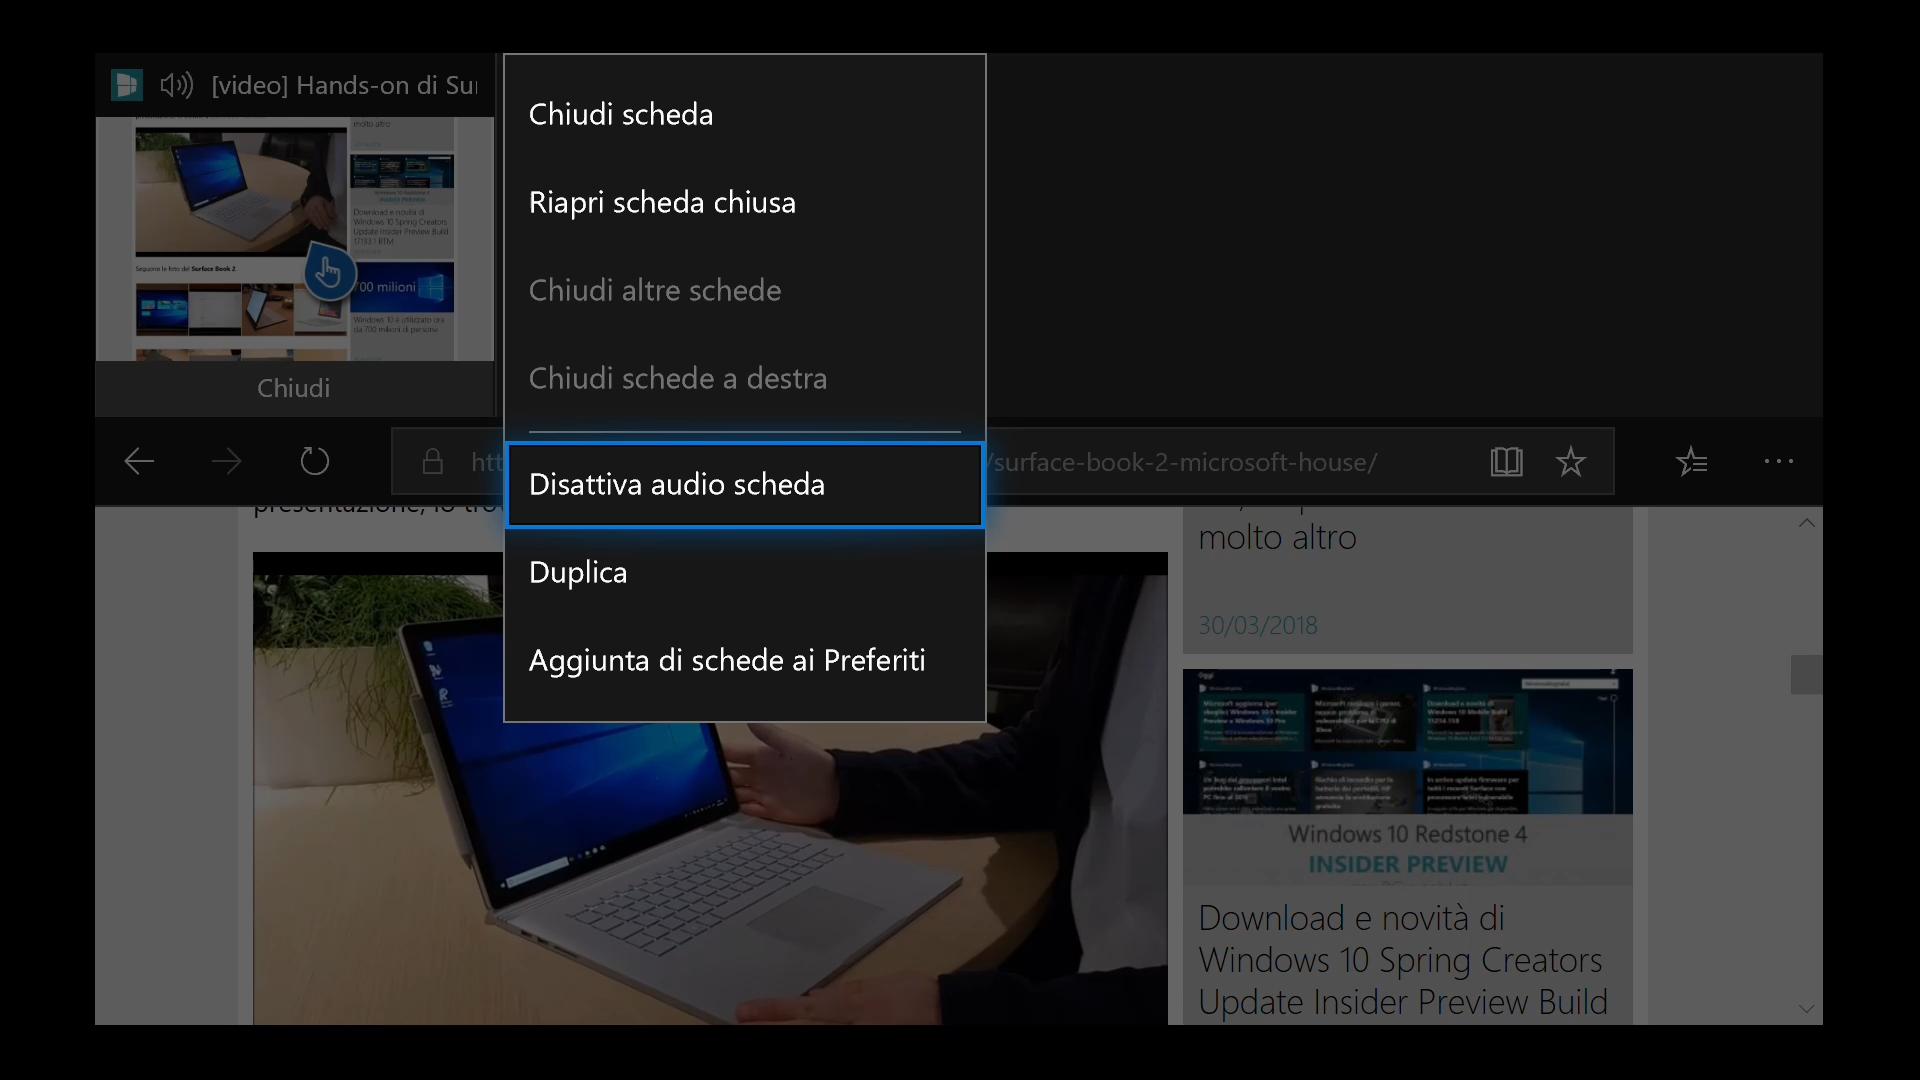 Xbox One Windows 10 Spring Creators Update Microsoft Edge disattiva audio scheda